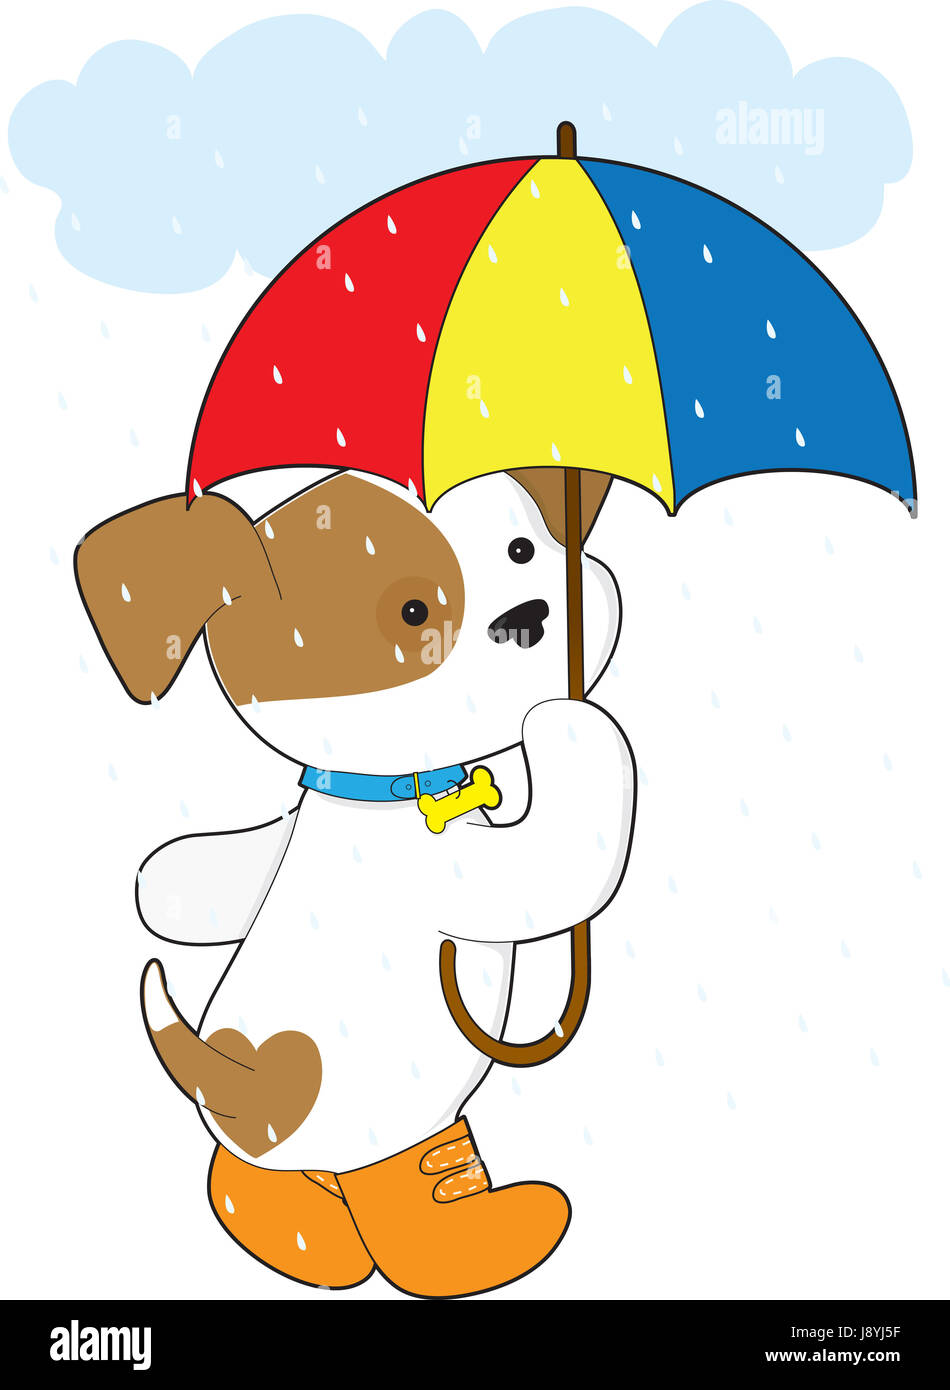 pet umbrella wet puppy rain maddening pert coquettish cute